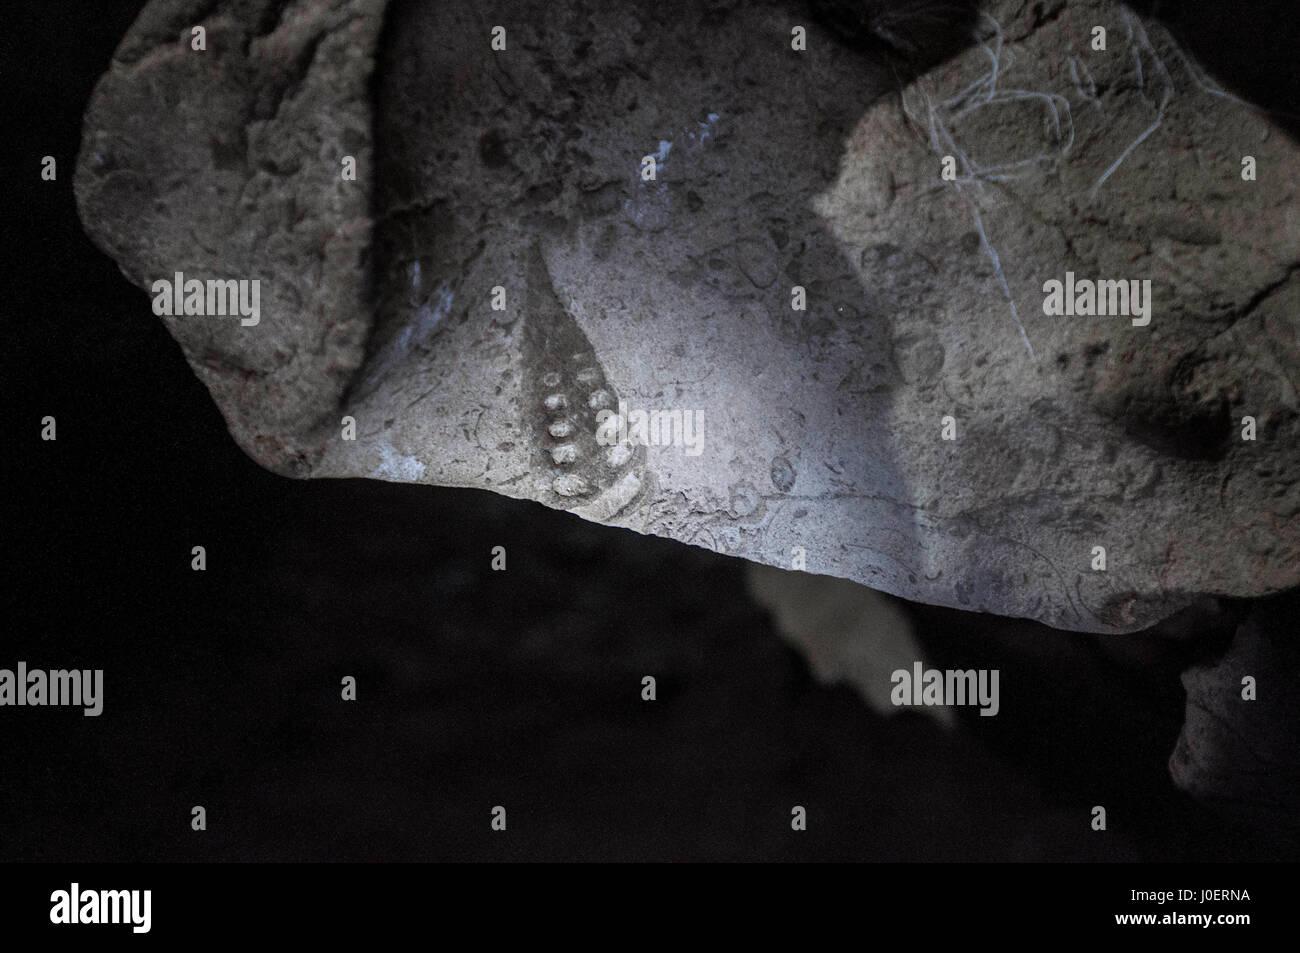 Fossiles sur les murs, mawsmai, grottes, Meghalaya, en Inde, en Asie Photo Stock